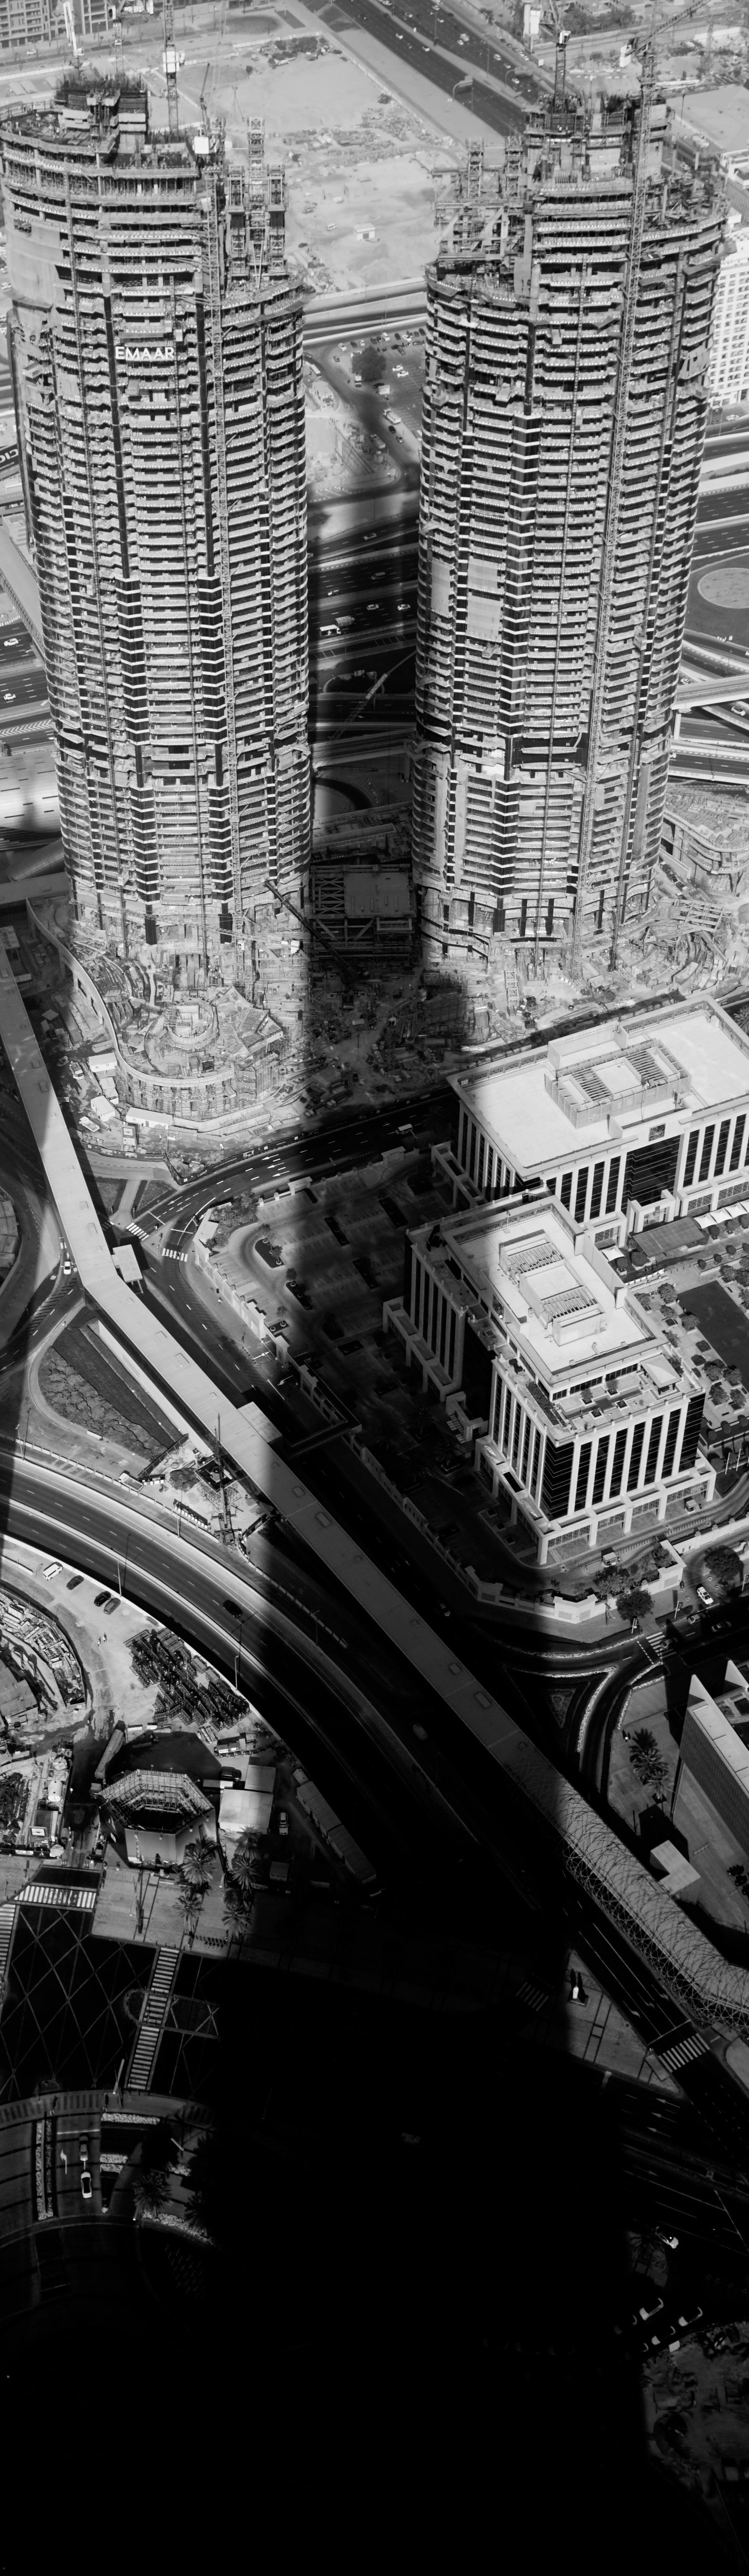 Free stock photo of burj khalifa as shadow